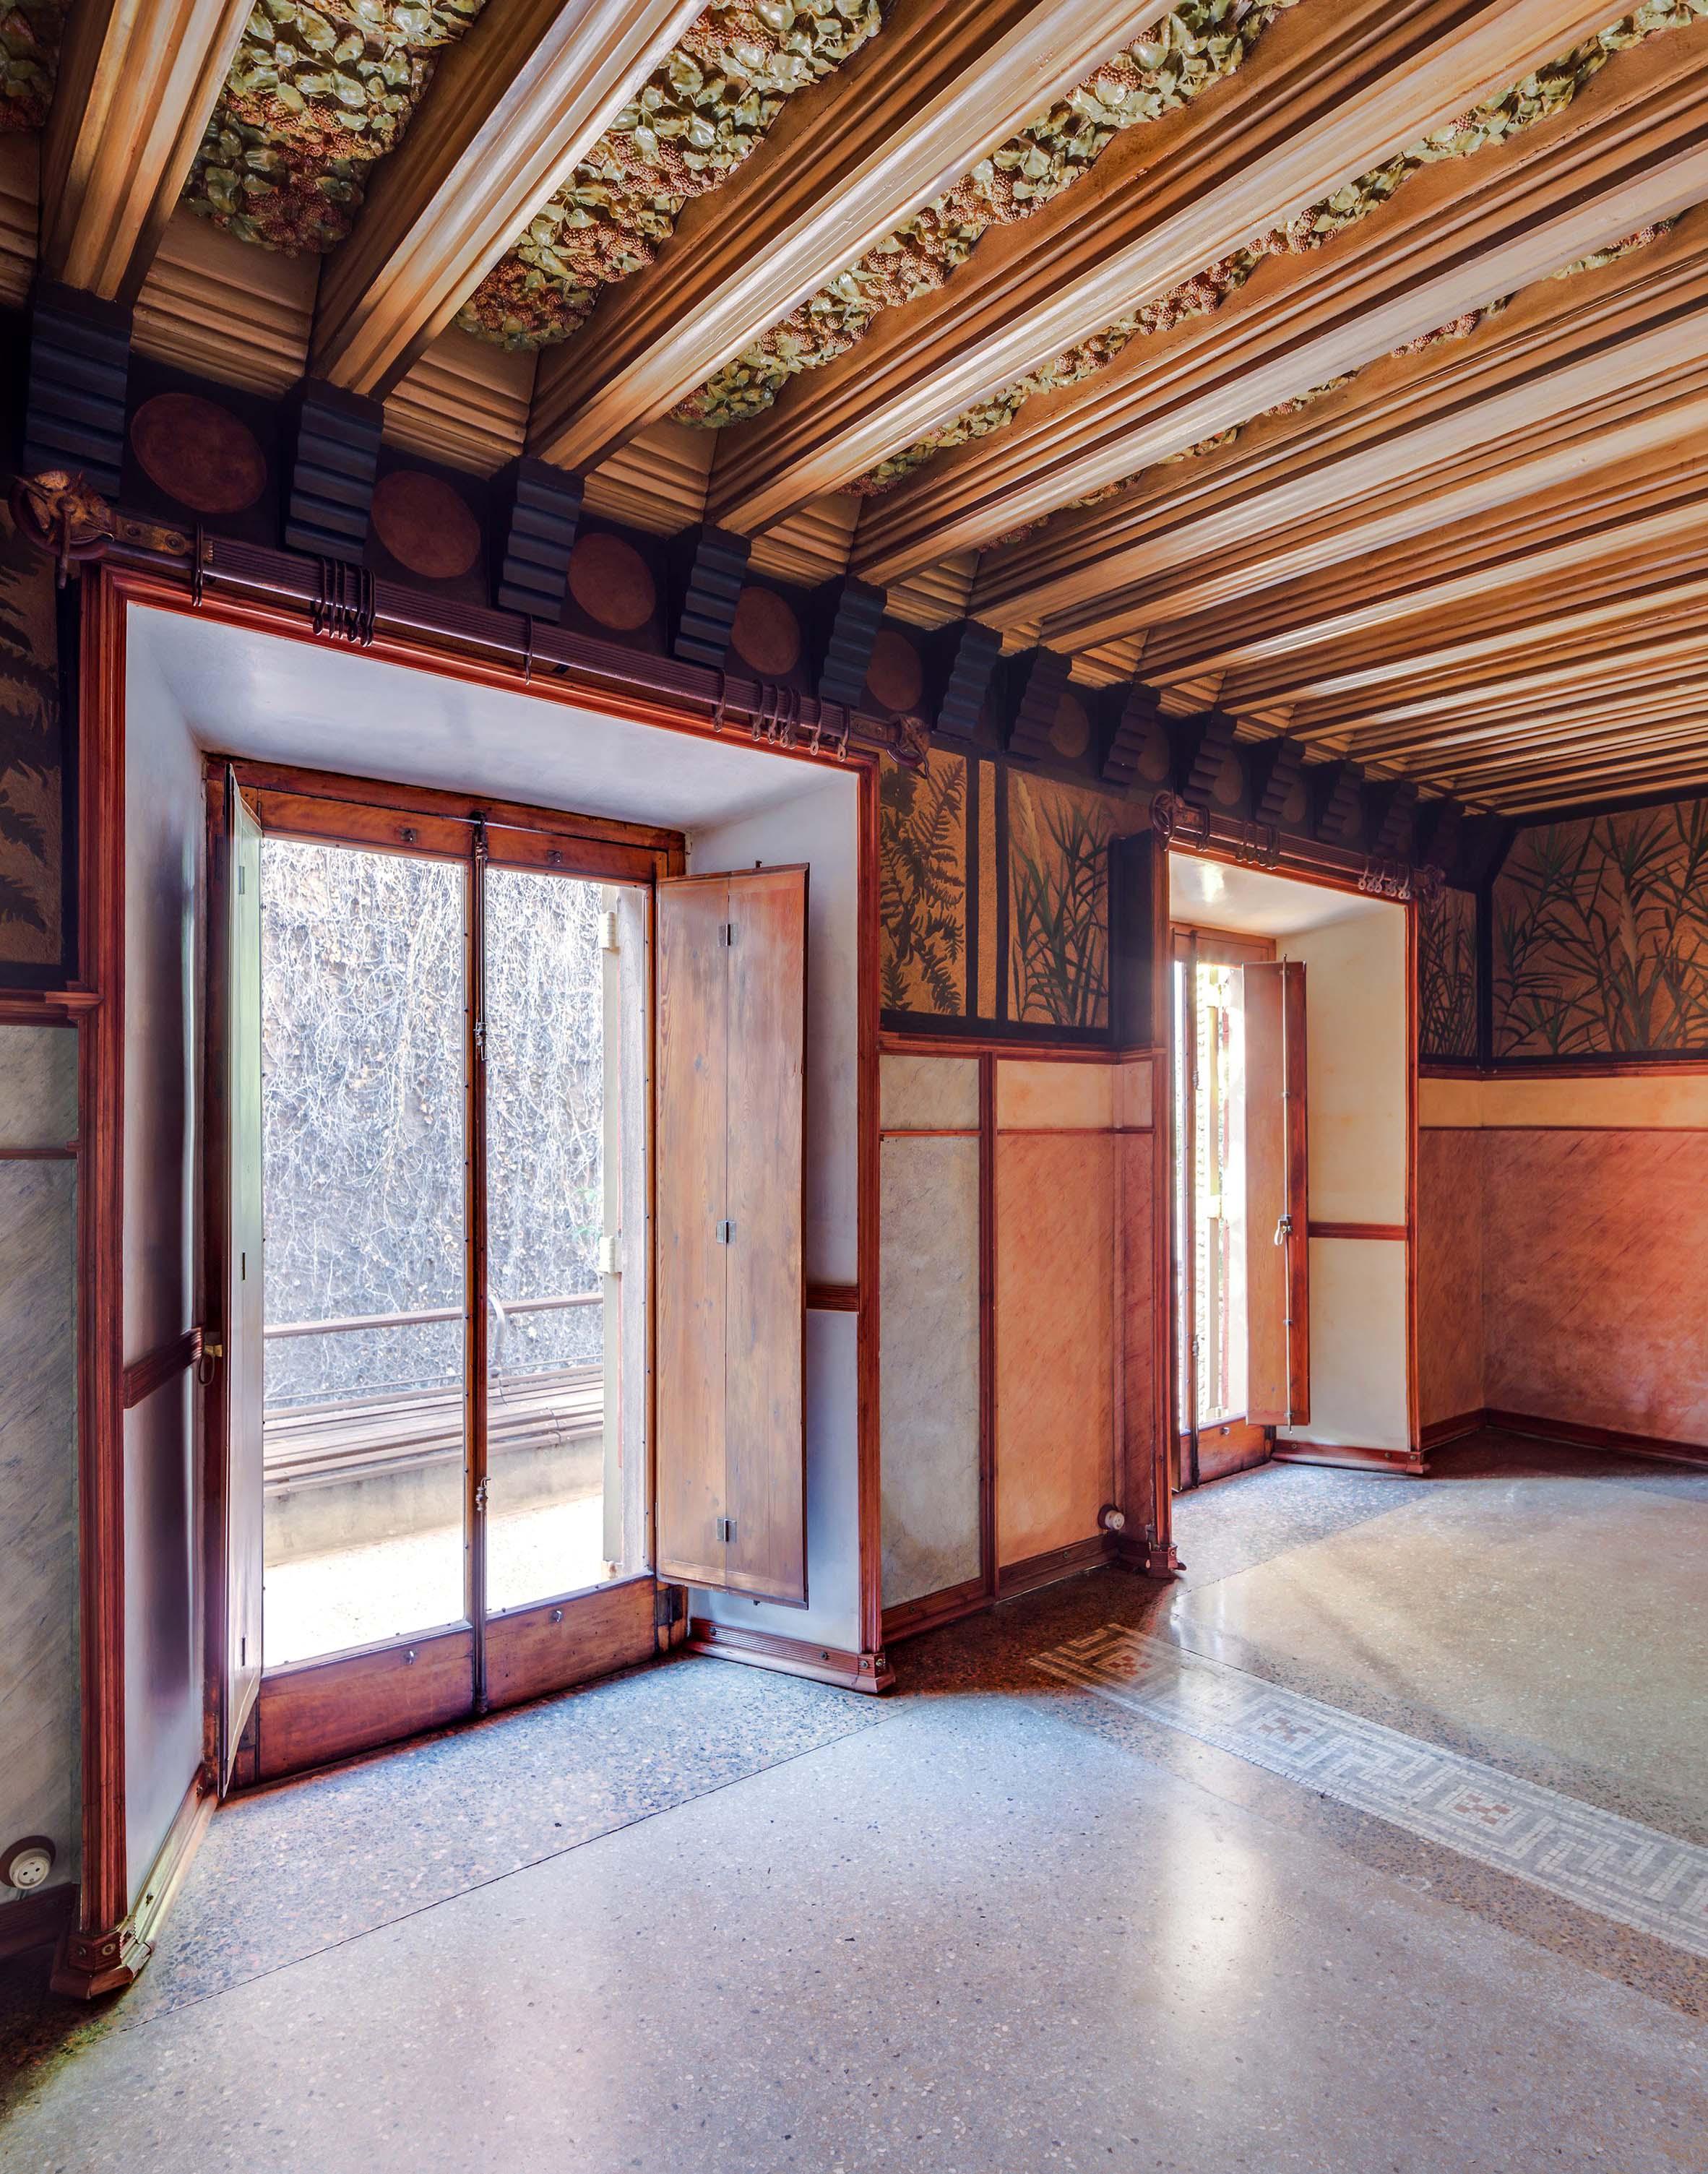 Tasarım - Mimarlık - Gaudi - Casa Vicens - BarcelonaTasarım - Mimarlık - Gaudi - Casa Vicens - Barcelona